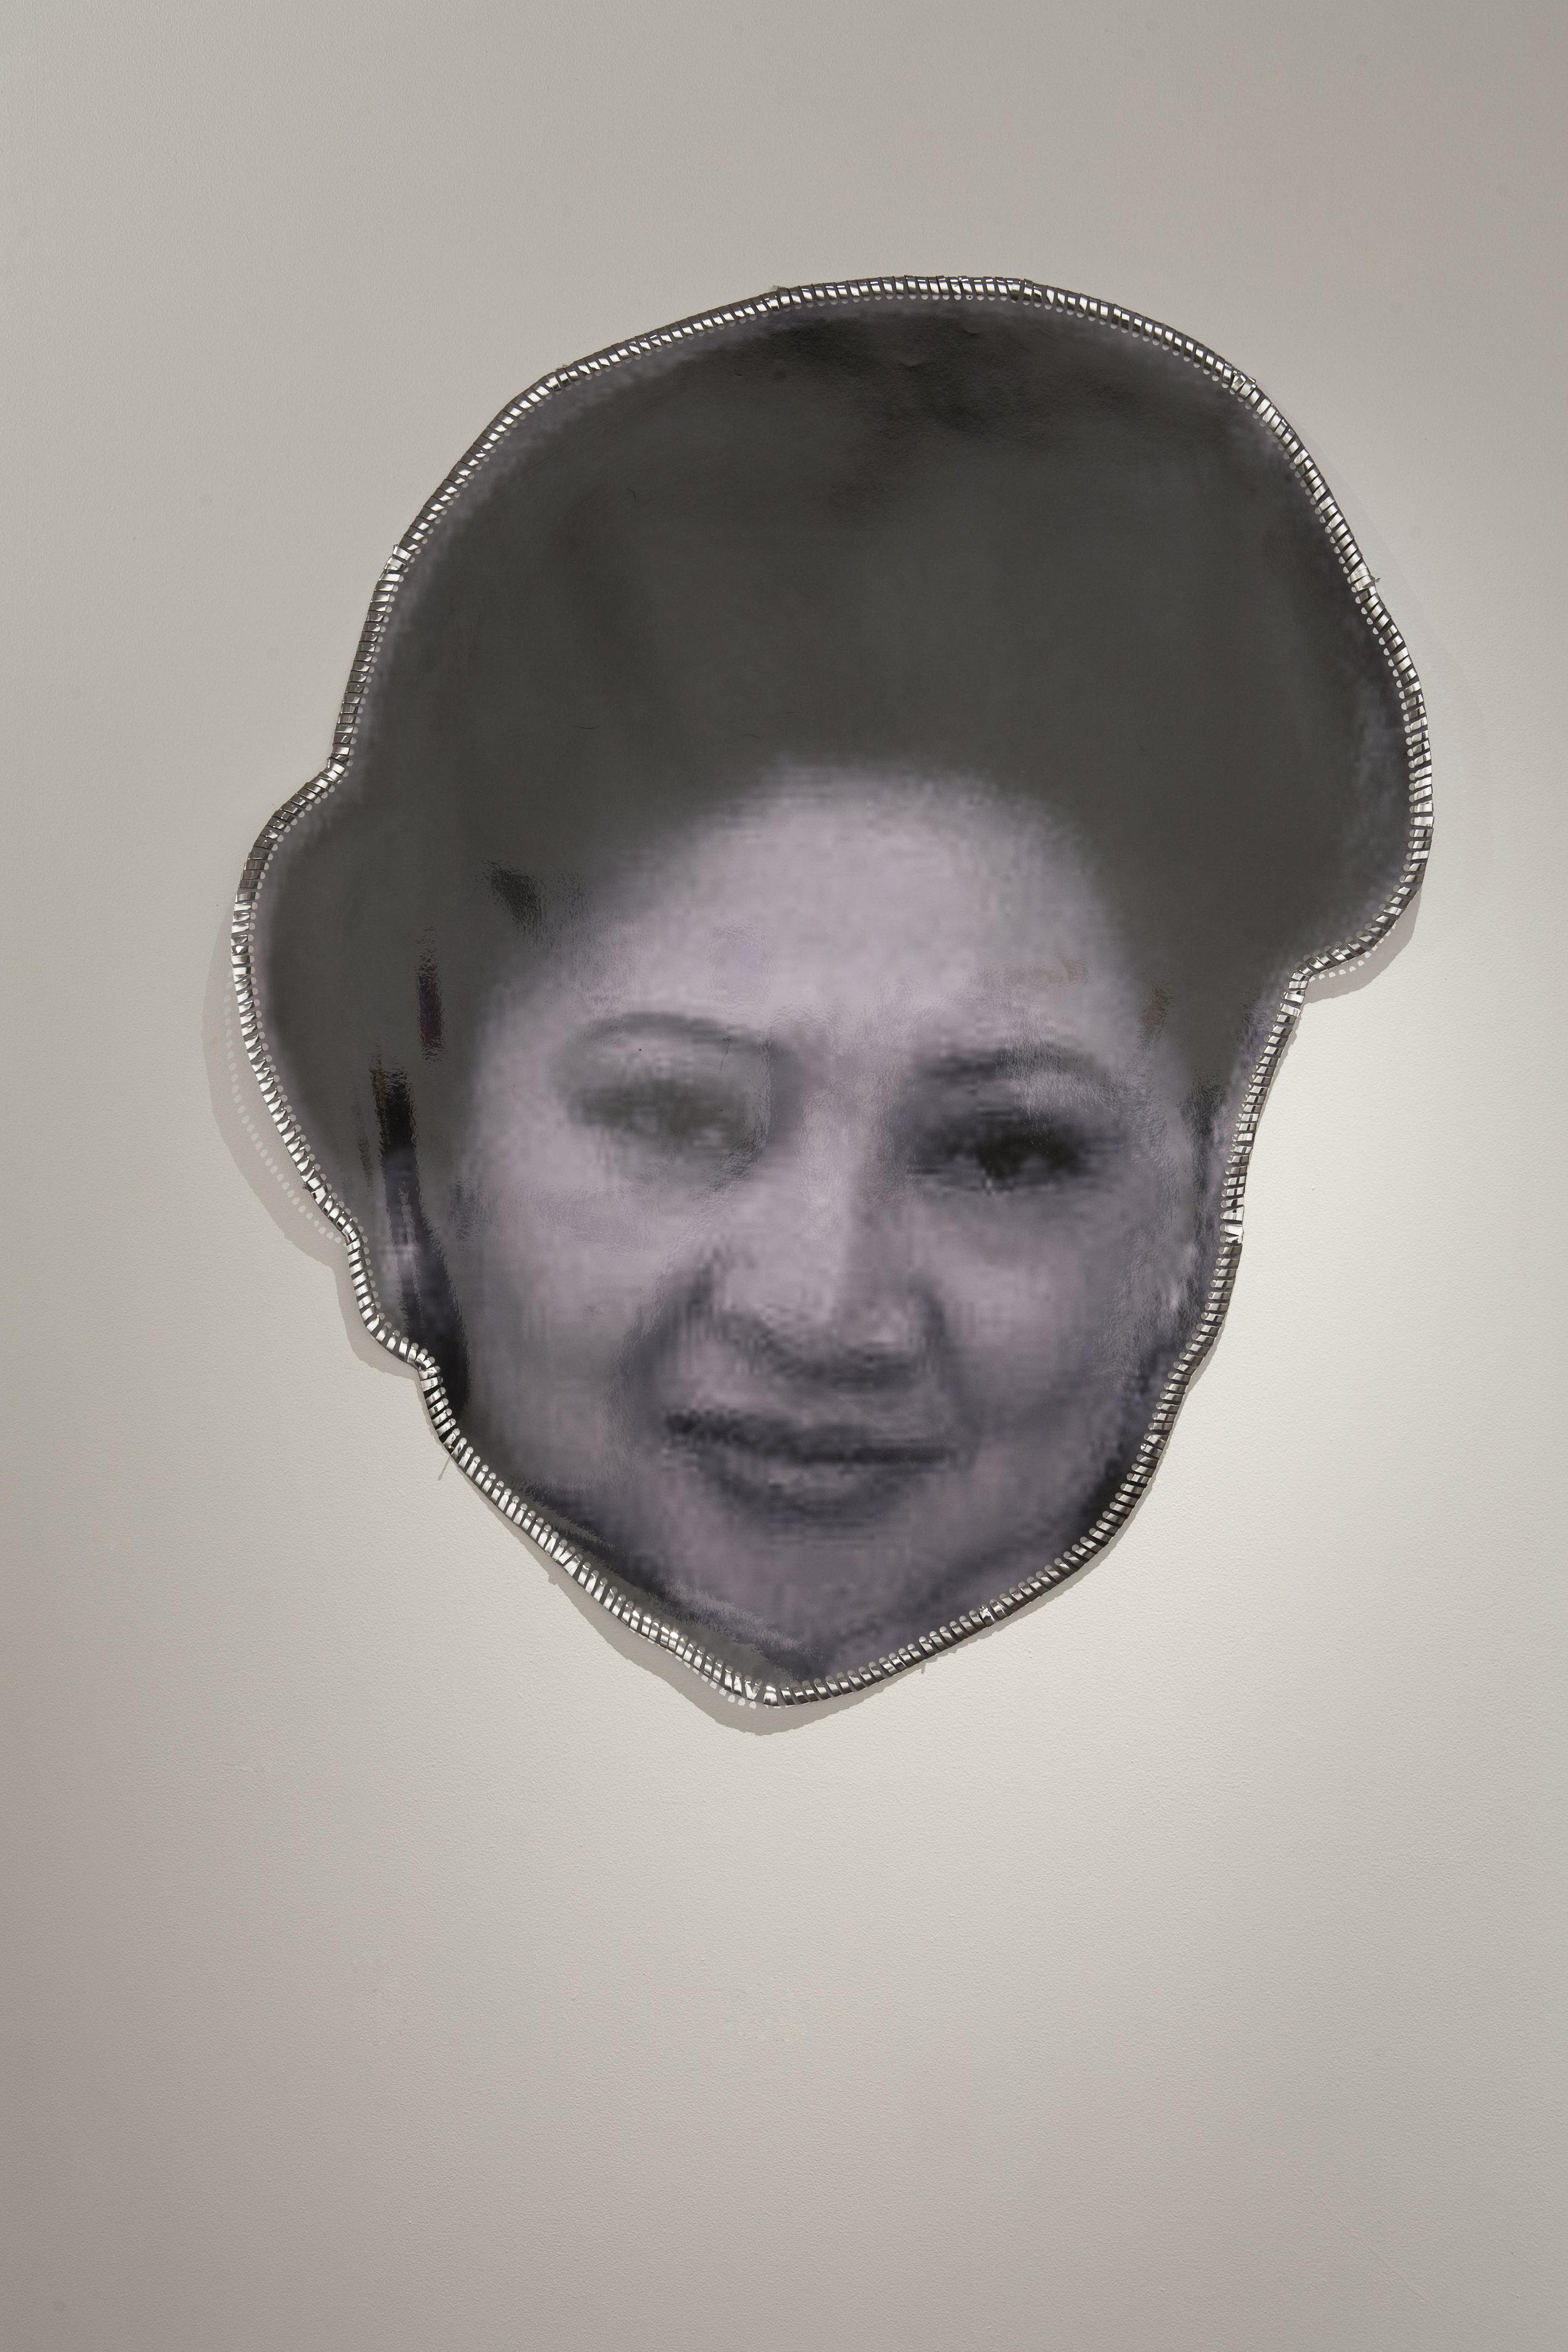 M.O.M. , 2011, digital composed and laminated photograph,installation view,  M.O.M. (Muse of Manila) , 2011, Firstdraft, Sydney. Photo: Charles Dennington. Copyright JD Reforma